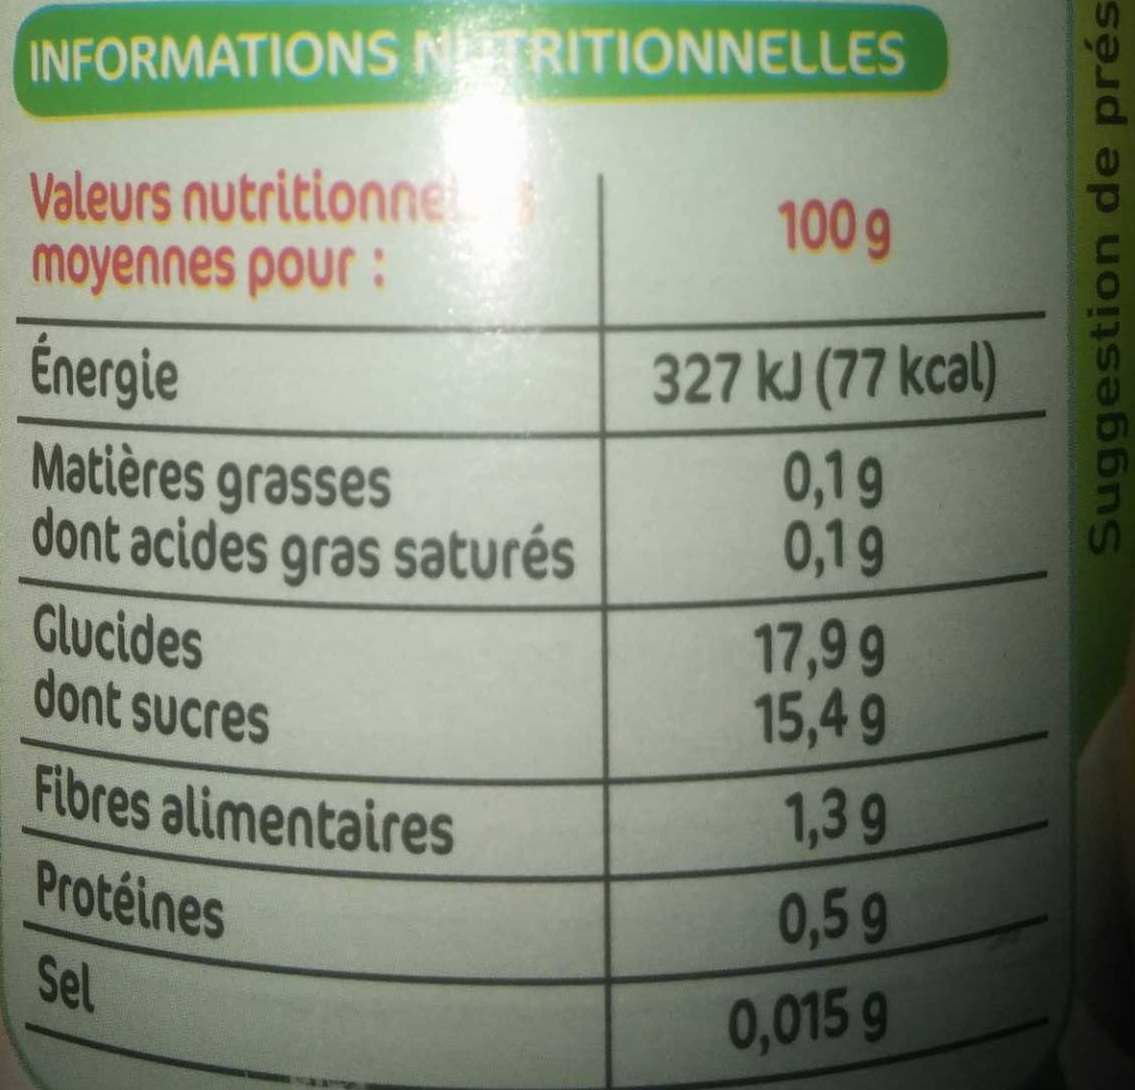 Poires william 1/2 fruits au sirop - Informations nutritionnelles - fr